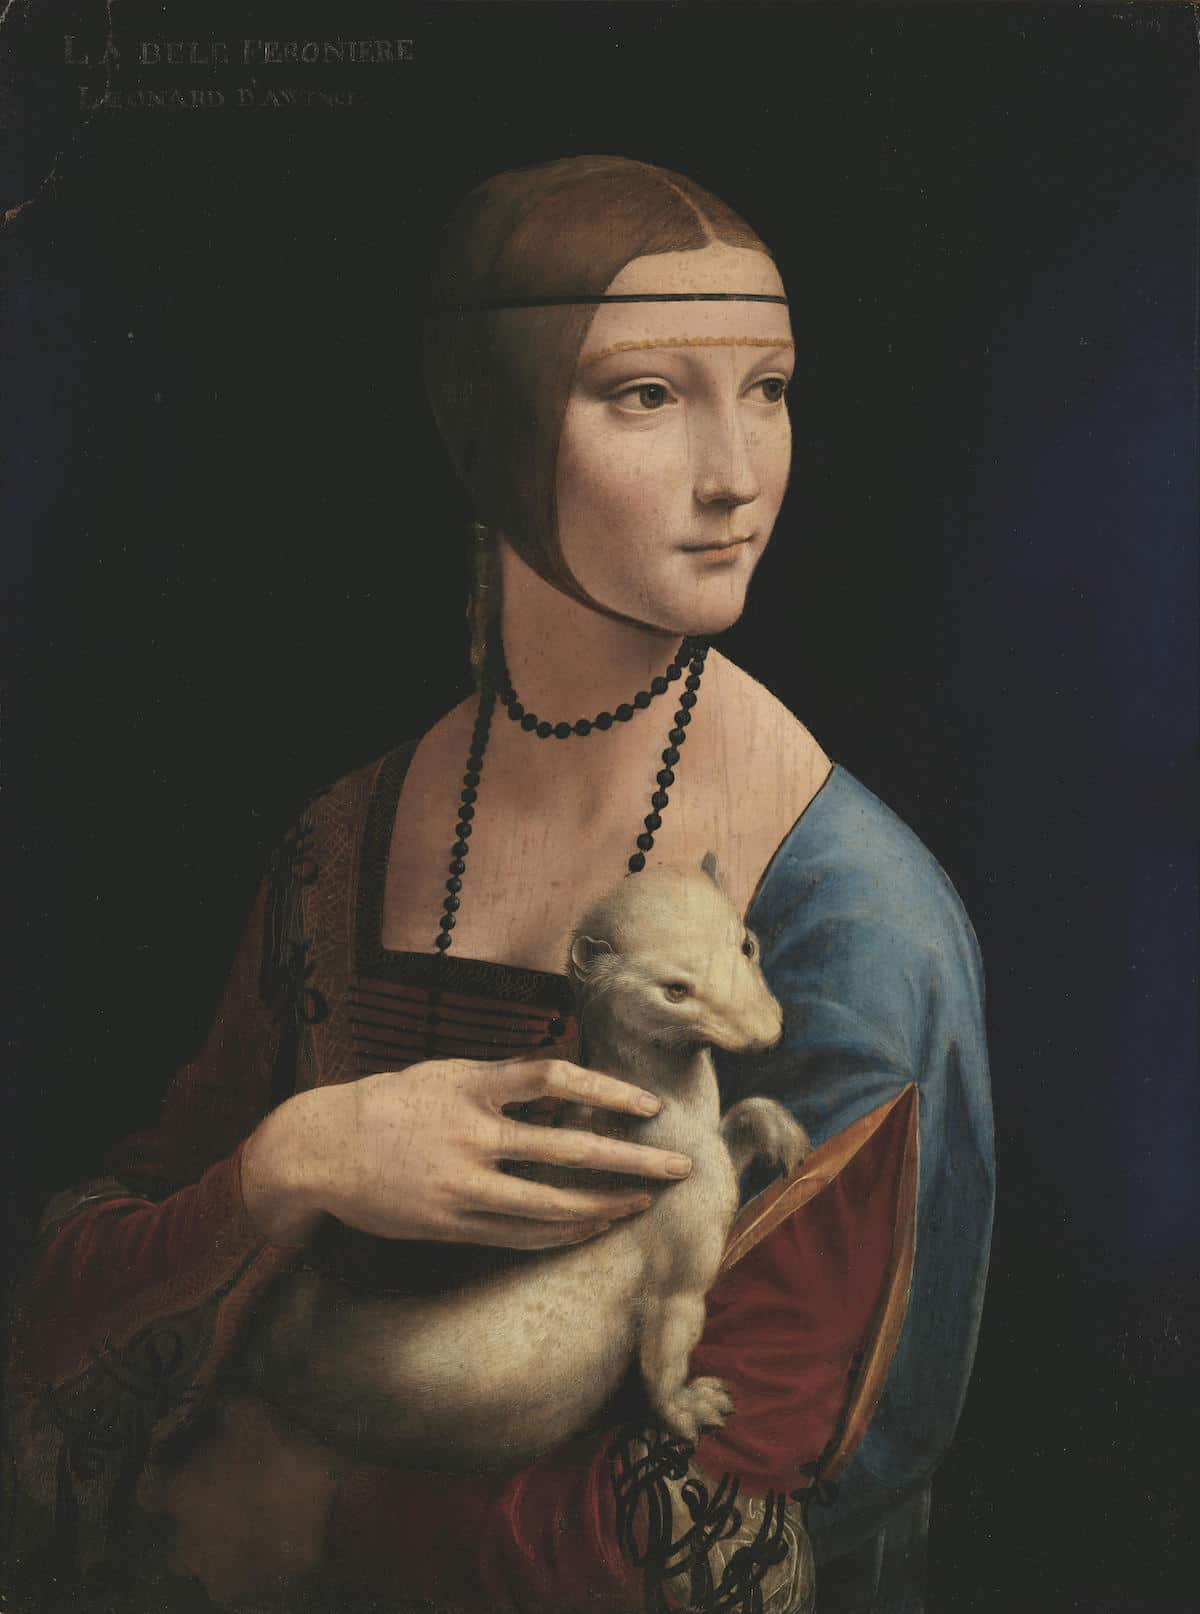 Lady With an Ermine Painting by Leonardo da Vinci